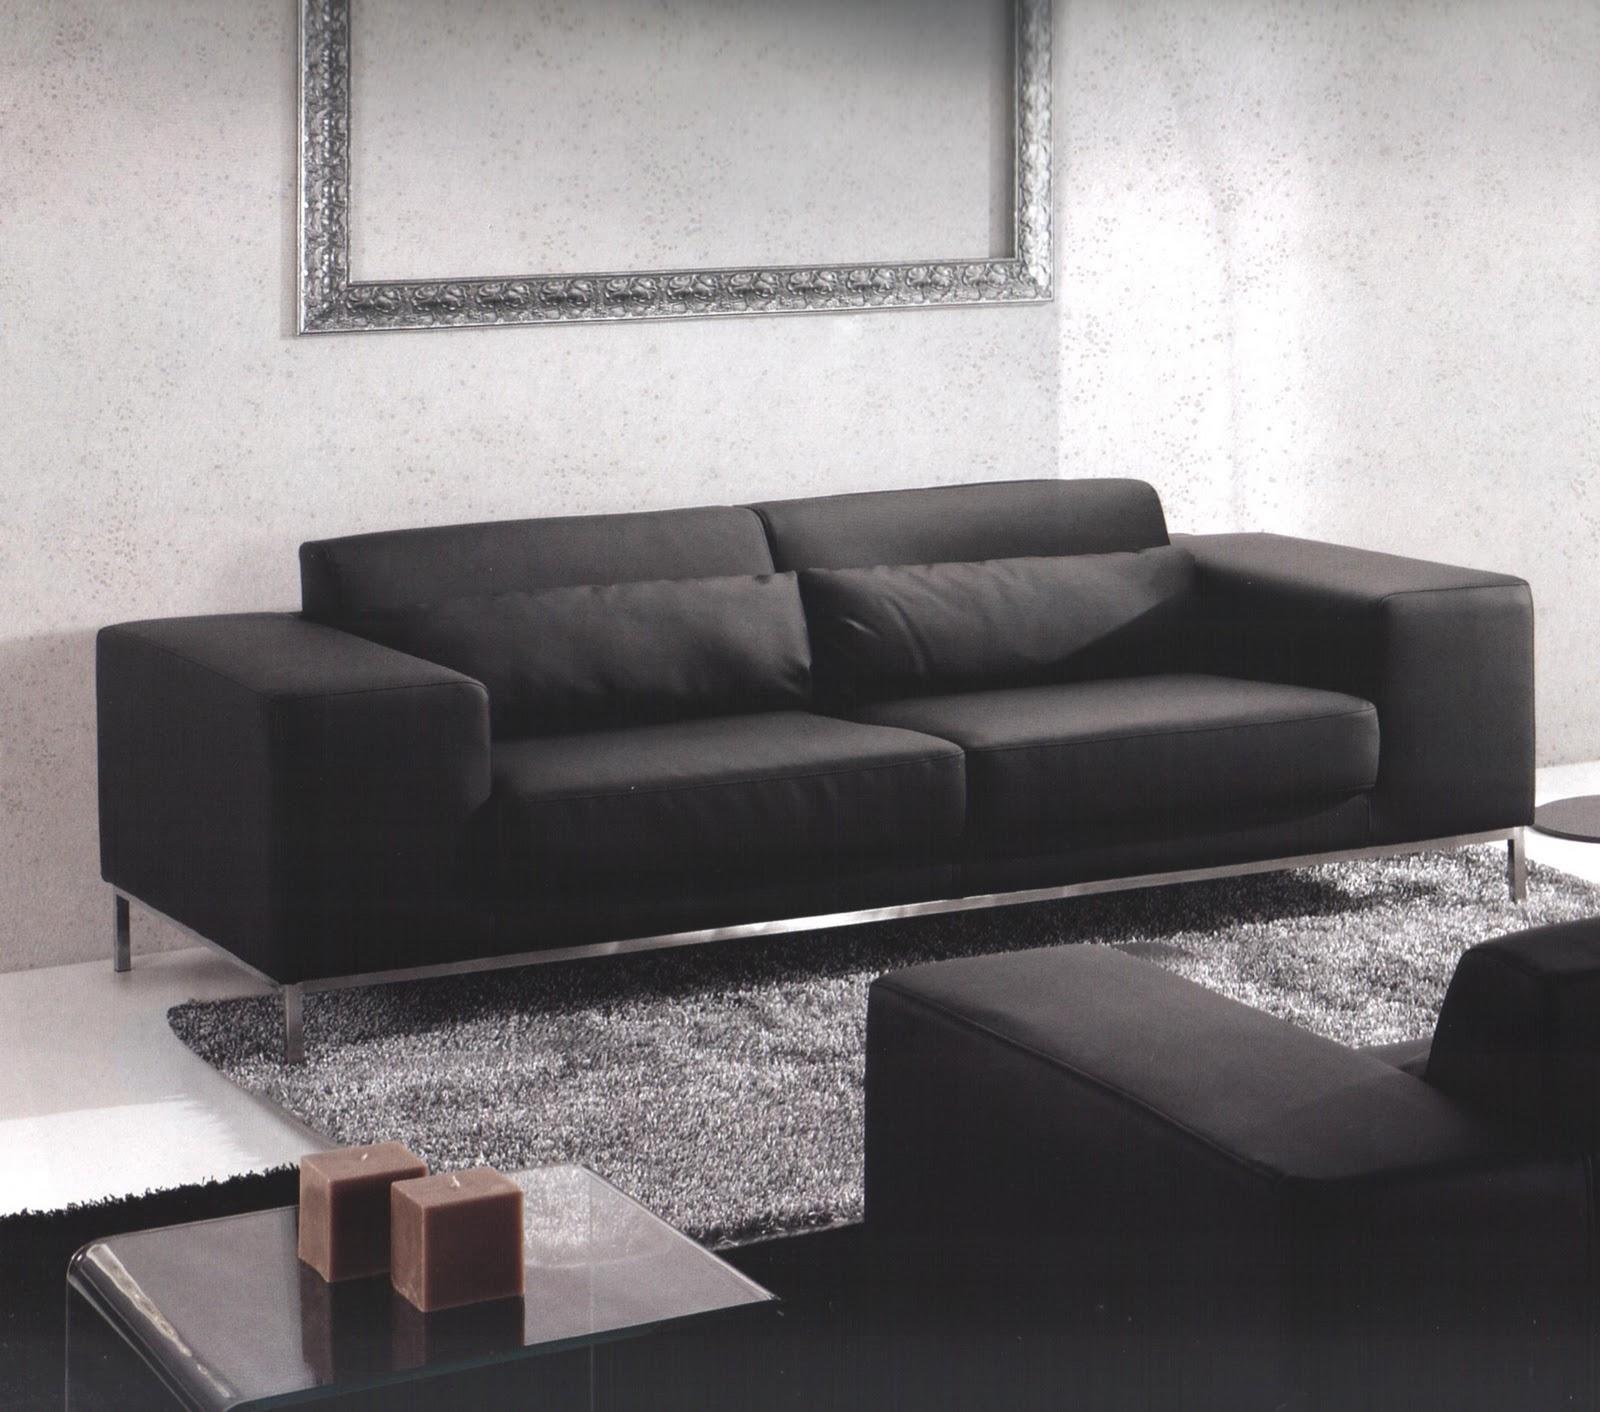 muebles vilu modelos de vanguardia